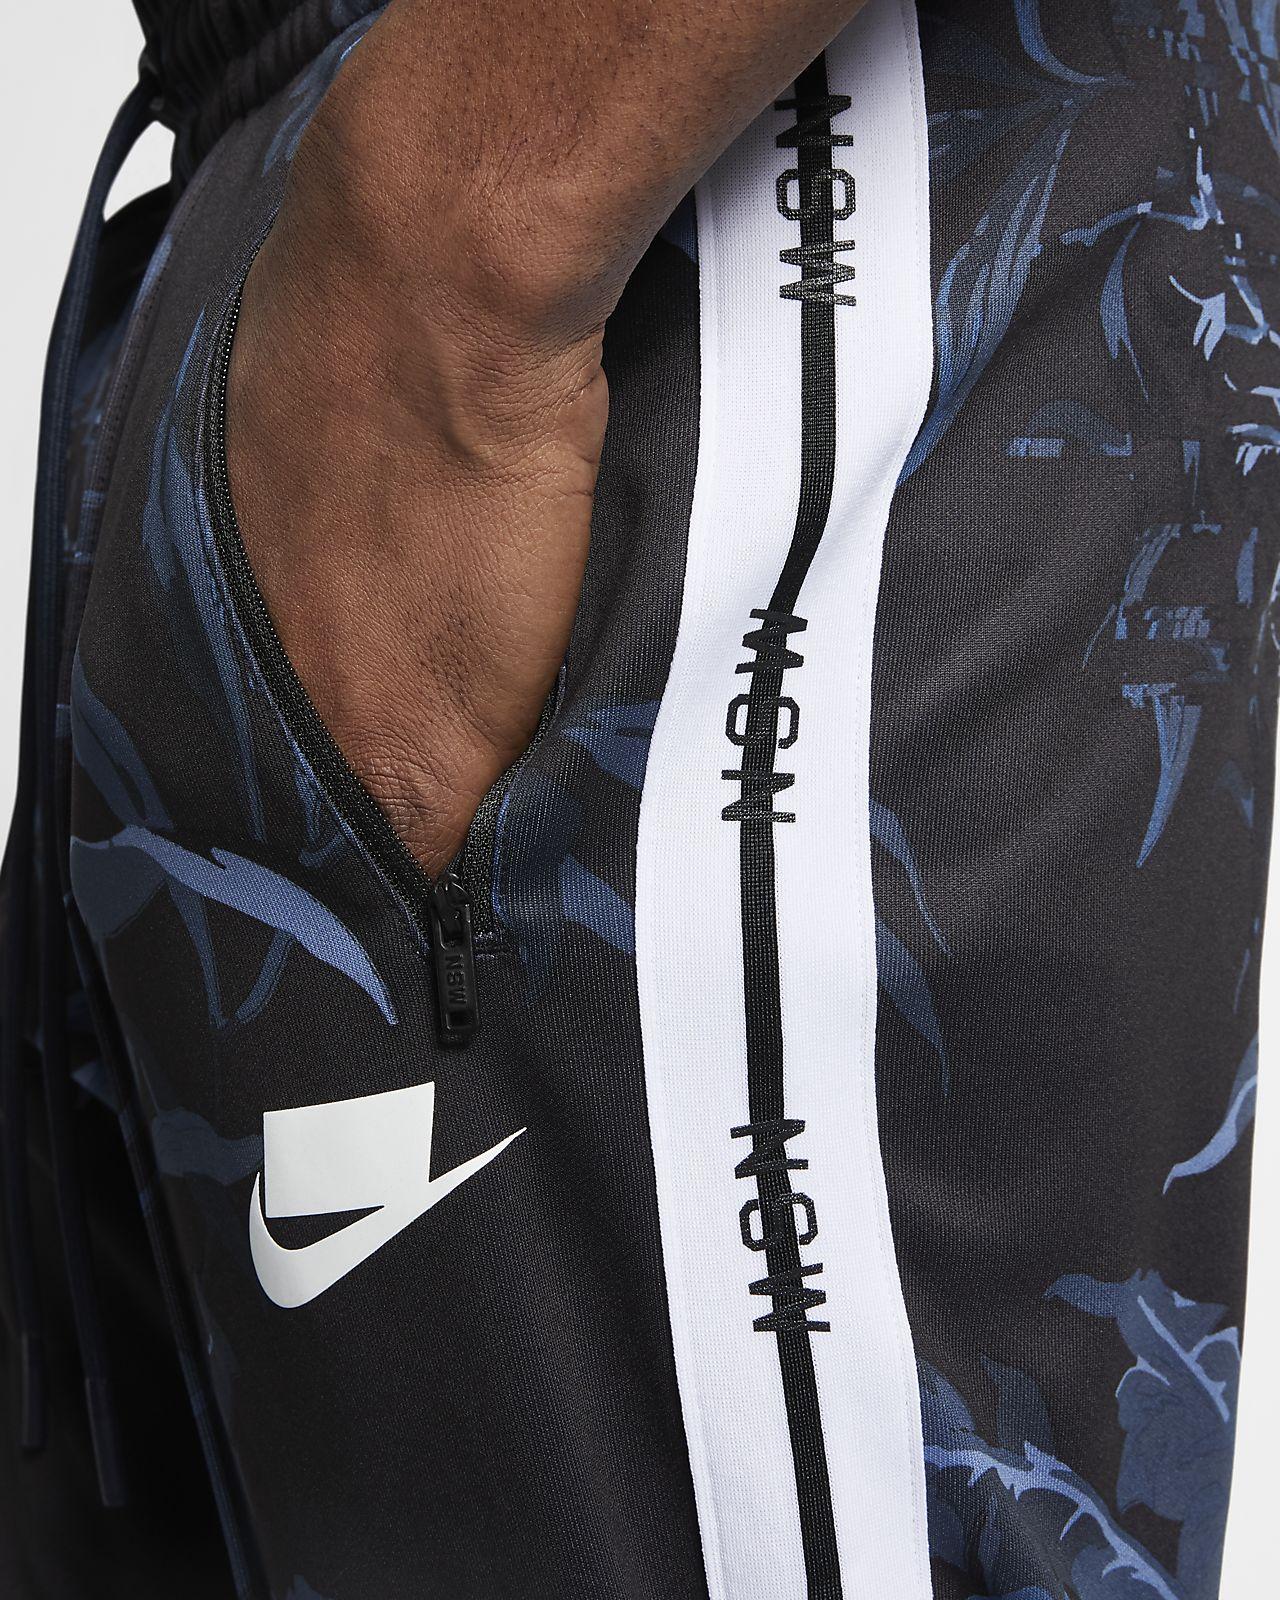 128c415ad1524 Low Resolution Nike Sportswear NSW Tracksuit Bottoms Nike Sportswear NSW  Tracksuit Bottoms